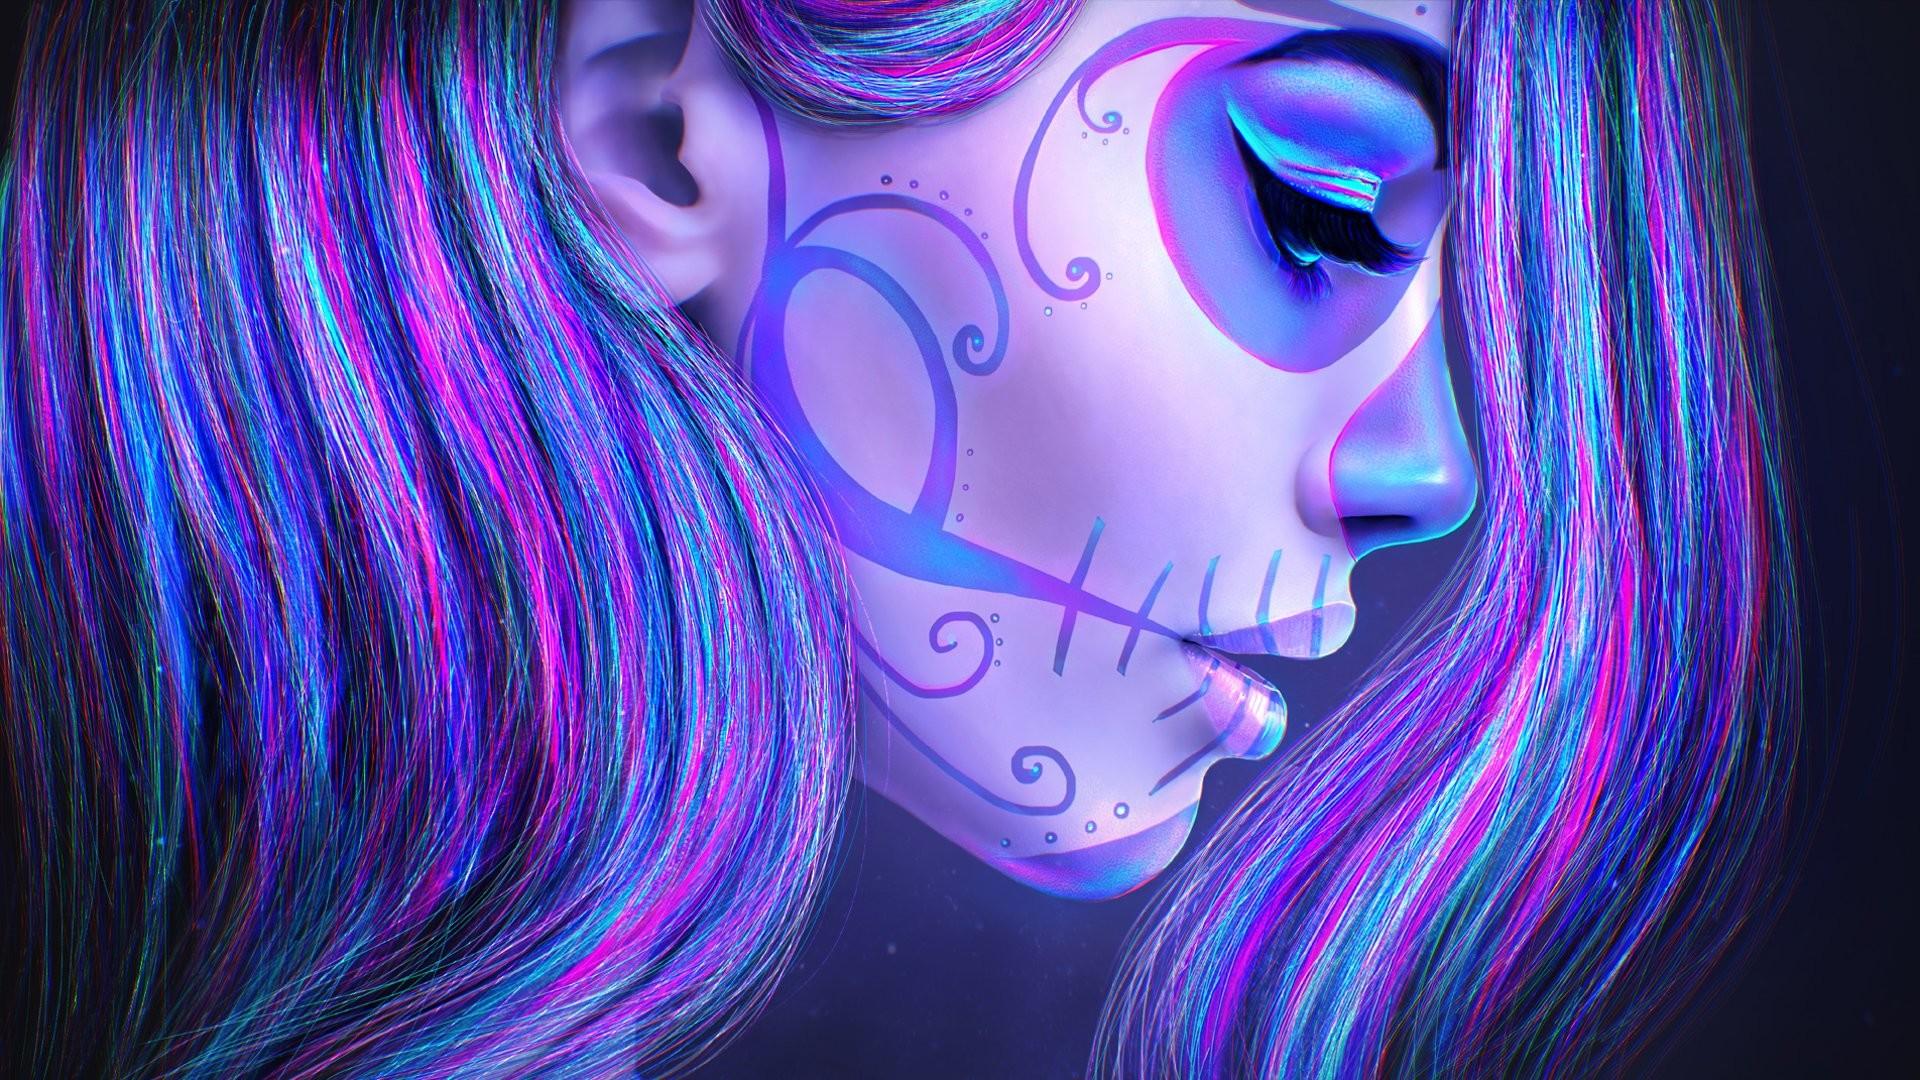 Res: 1920x1080, Artistic - Sugar Skull Wallpaper